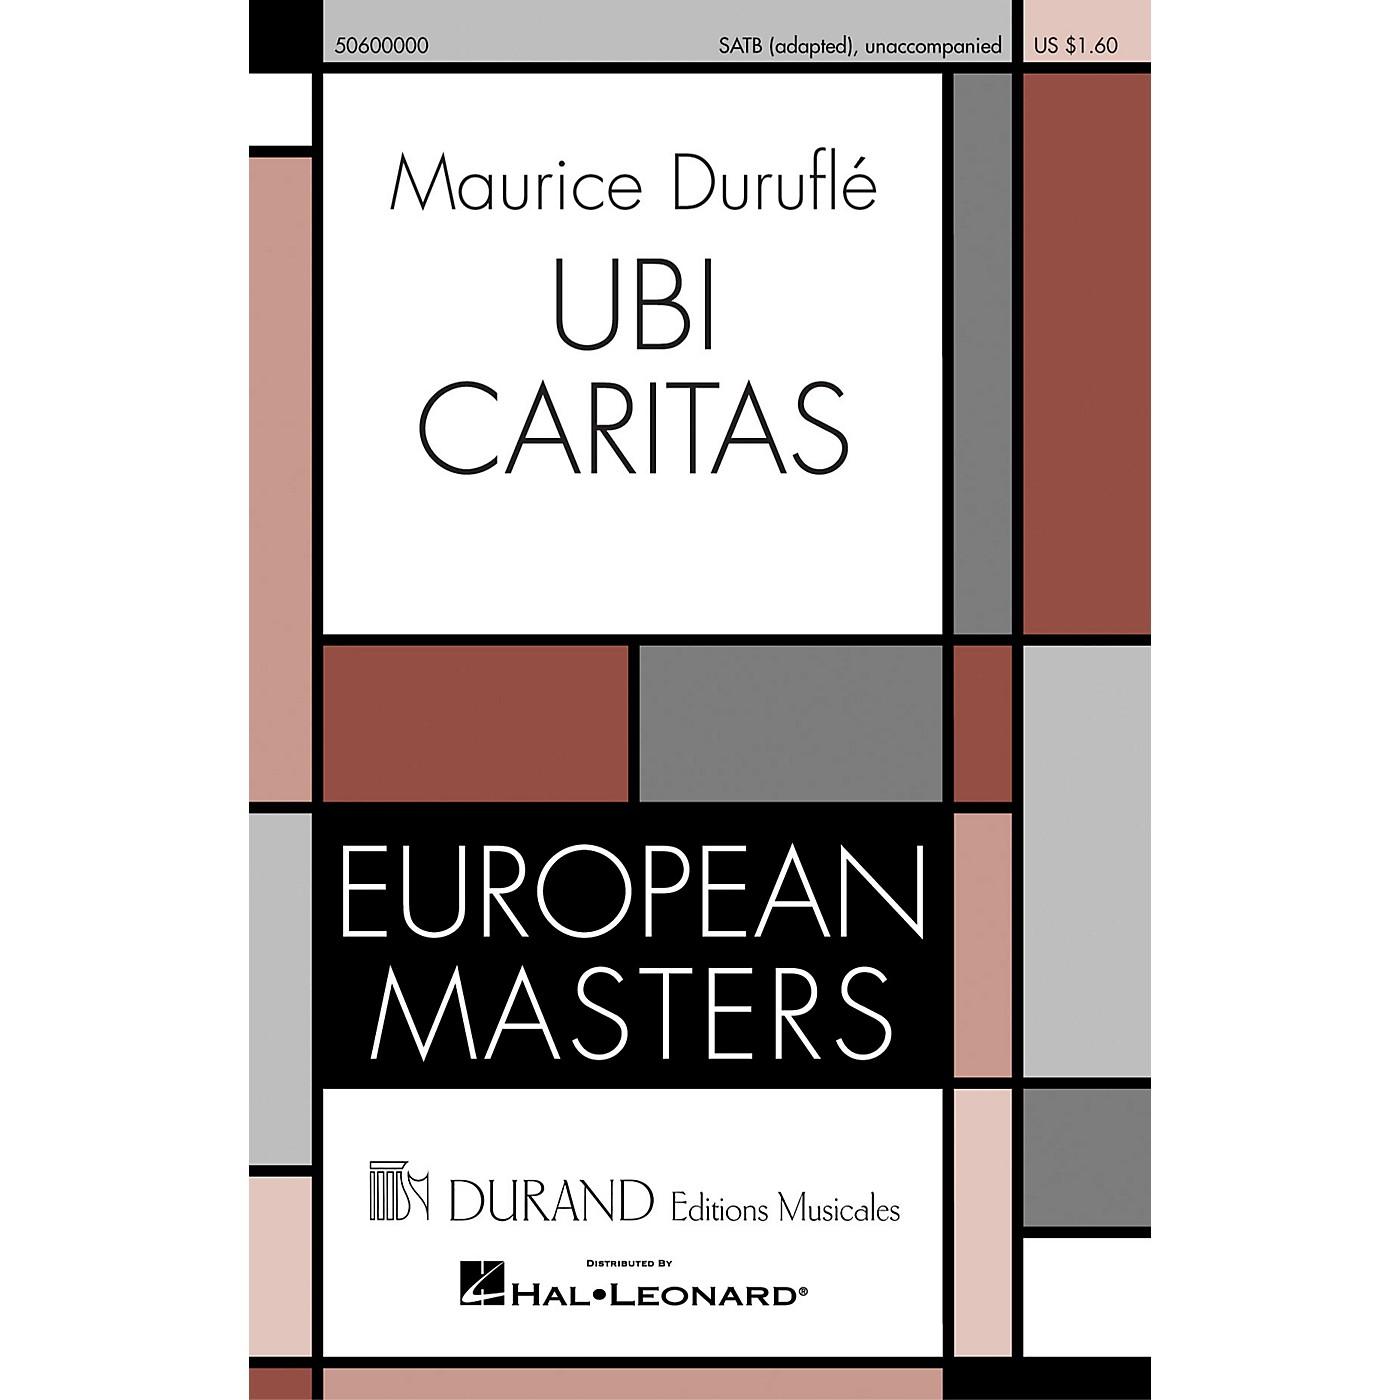 Editions Durand Ubi Caritas (European Masters Series) composed by Maurice Duruflé thumbnail